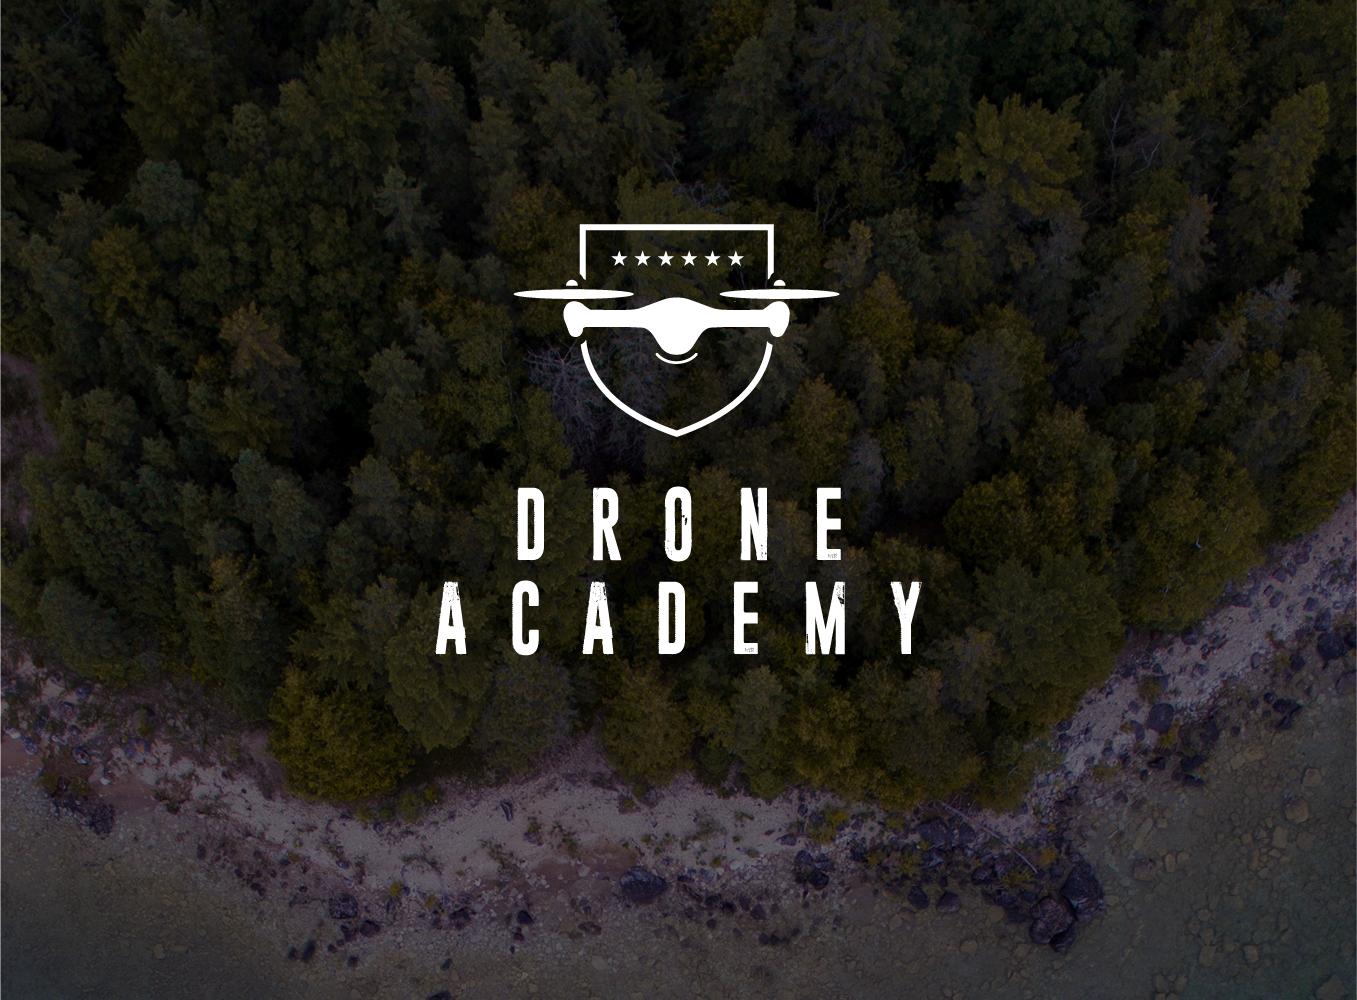 Drone Academy - Drone Training, News, & Reviews